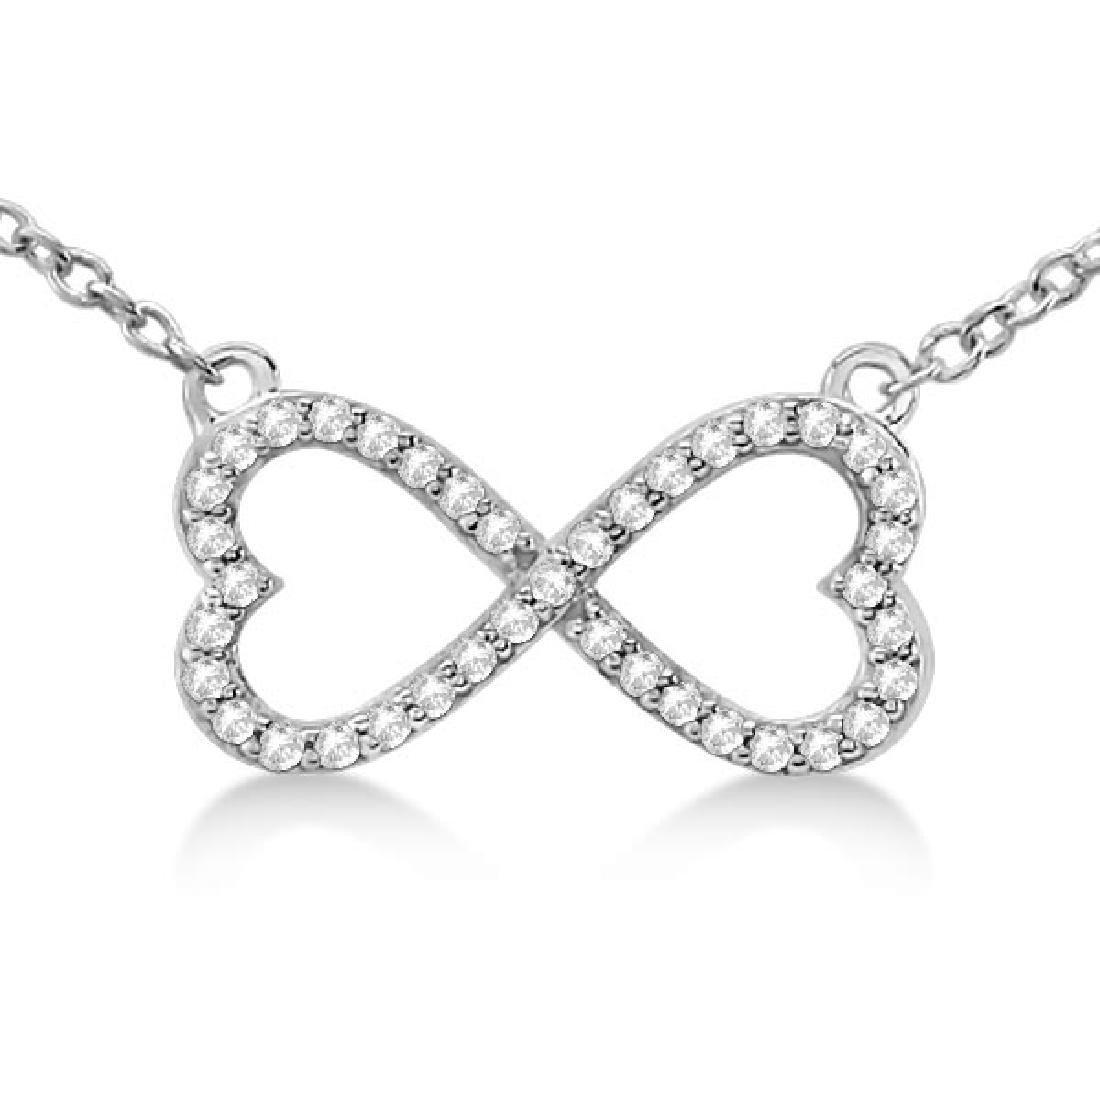 Pave Infinity Heart Diamond Pendant Necklace 14k White